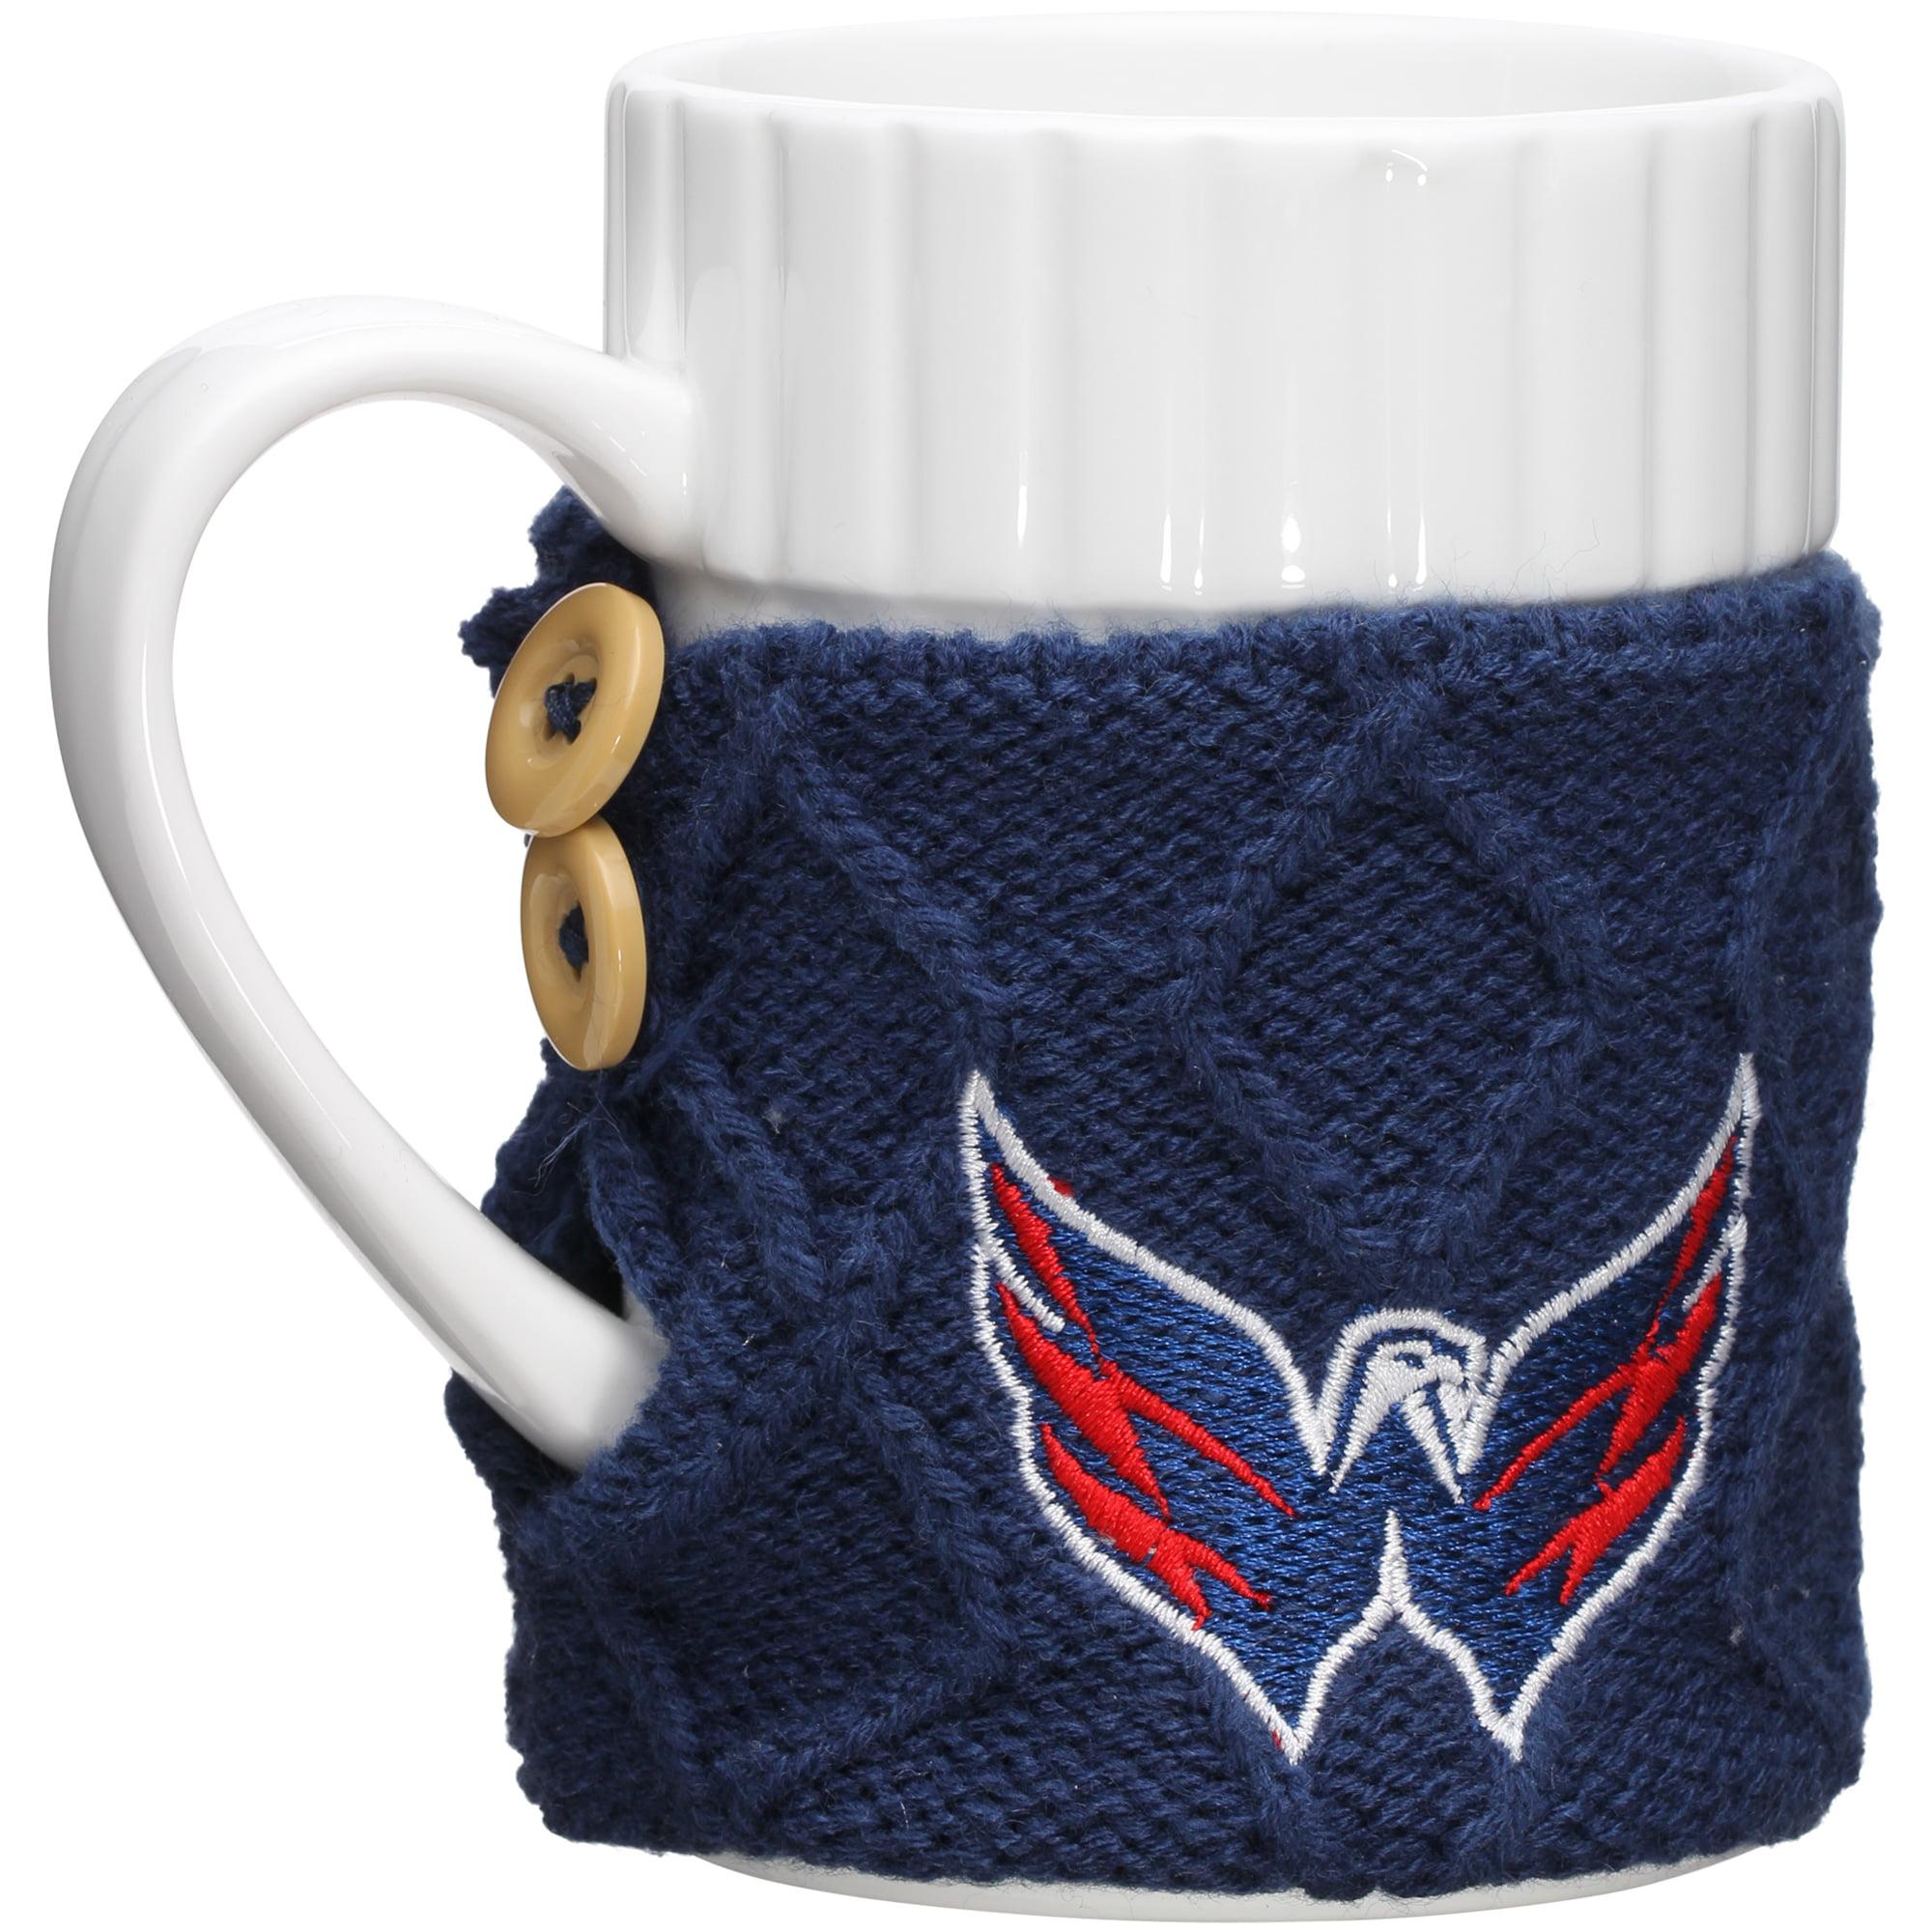 Washington Capitals Cable Knit Sweater Coffee Mug - No Size